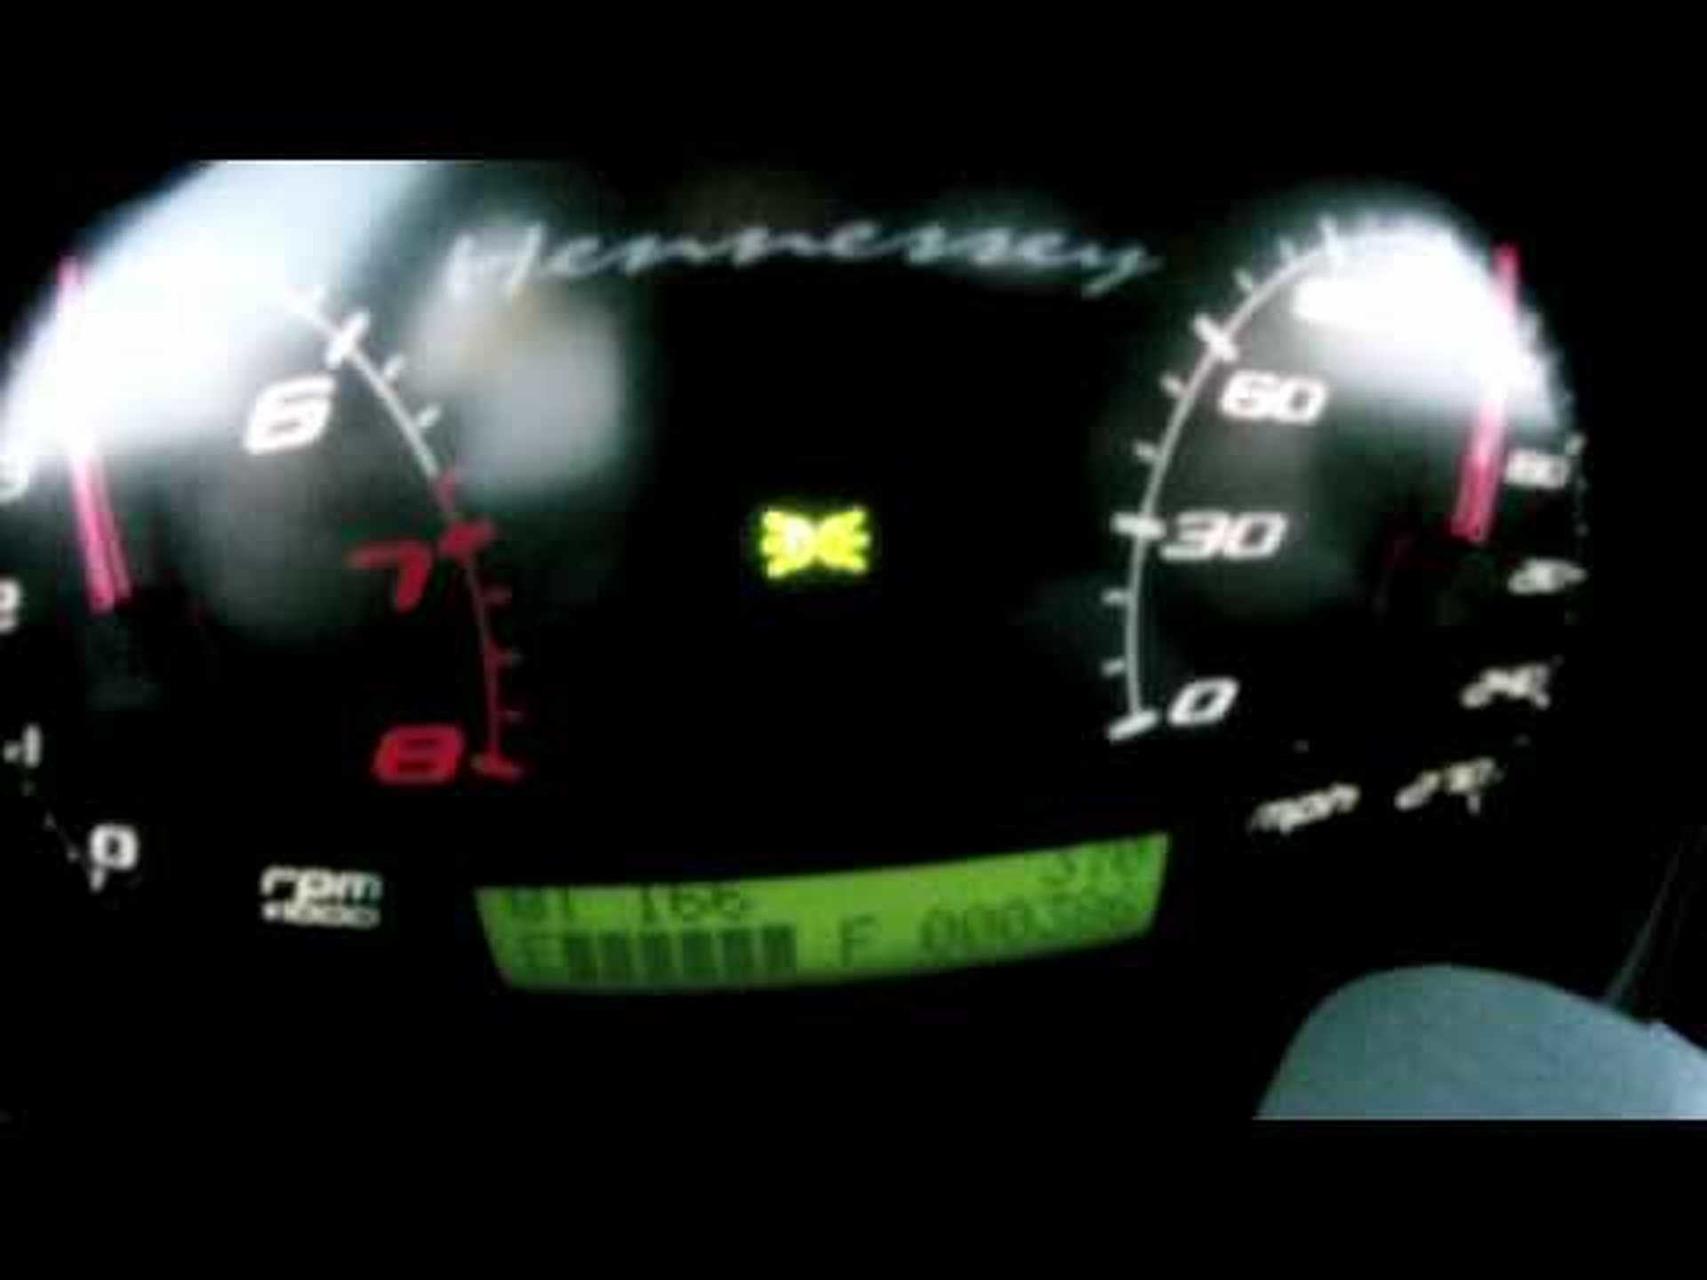 Hennessey Venom GT: 70 - 215 mph Acceleration